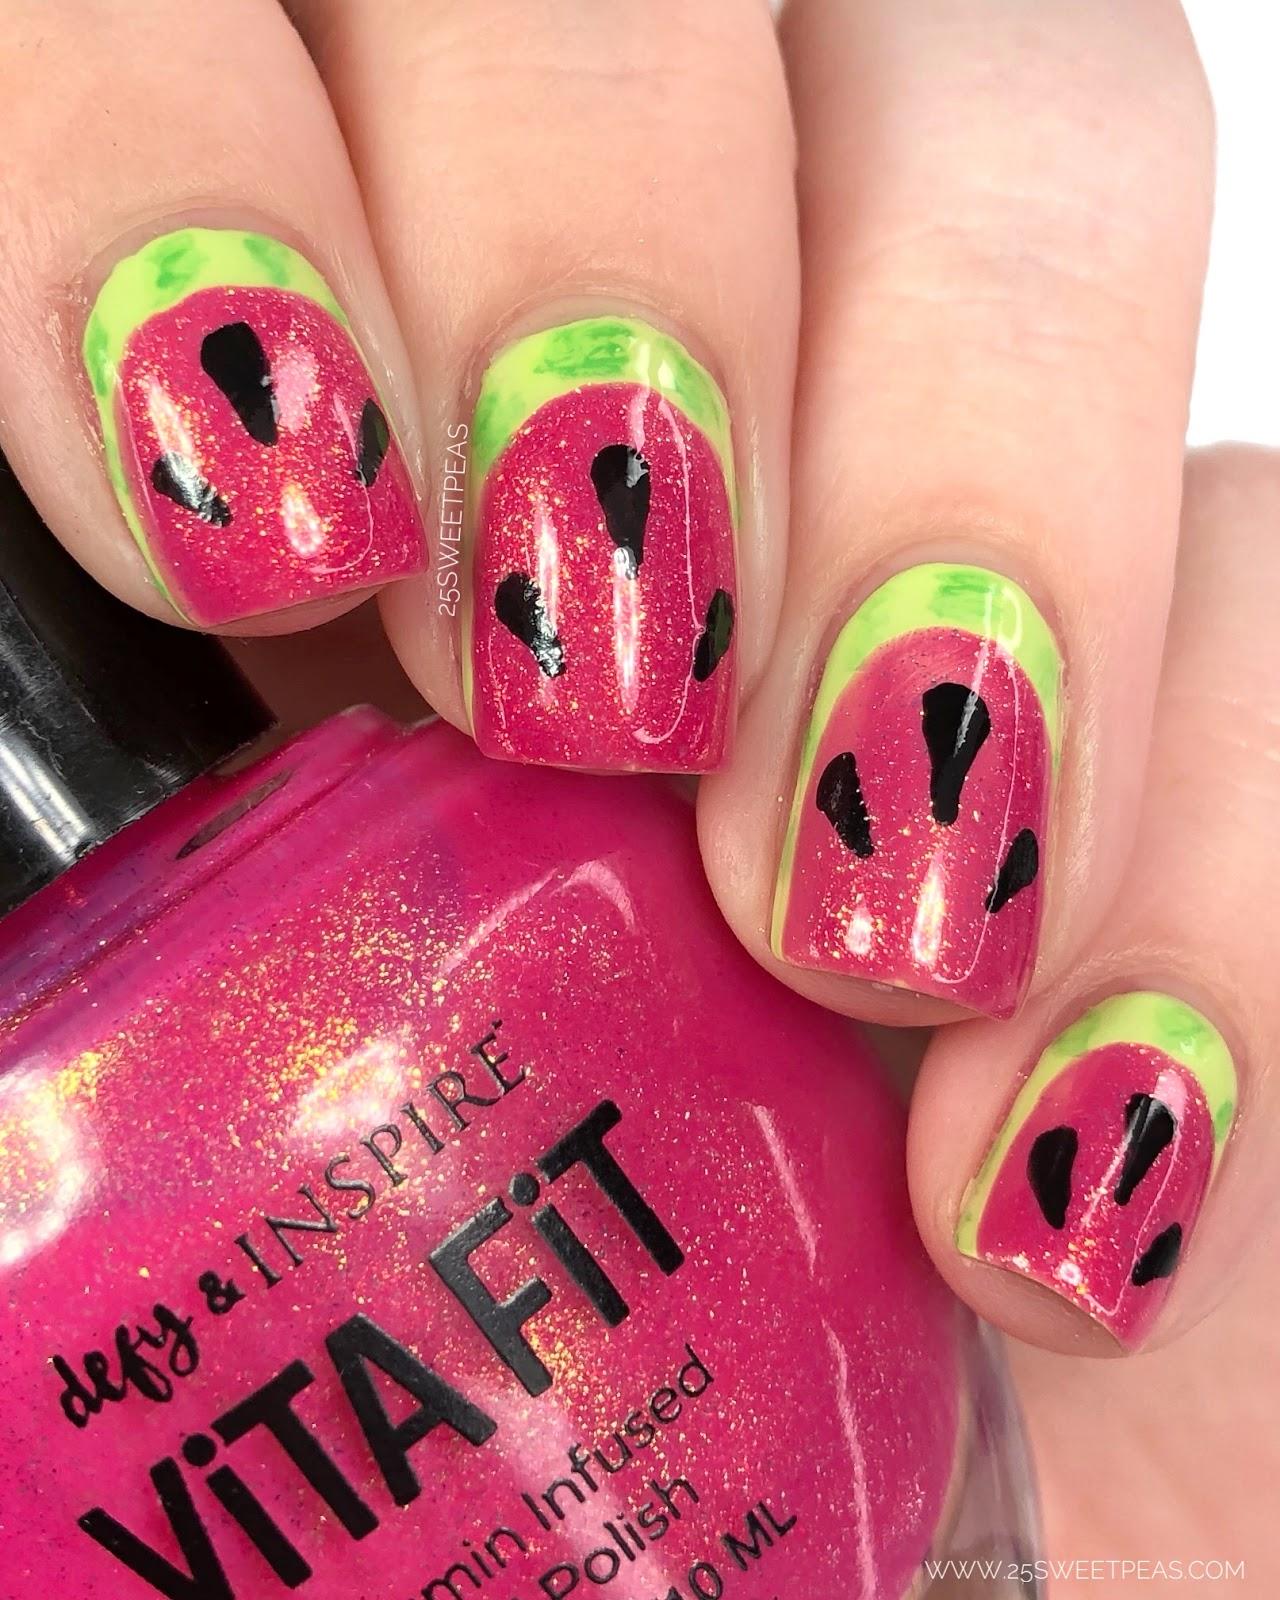 Easy Watermelon Nail Art - 25 Sweetpeas